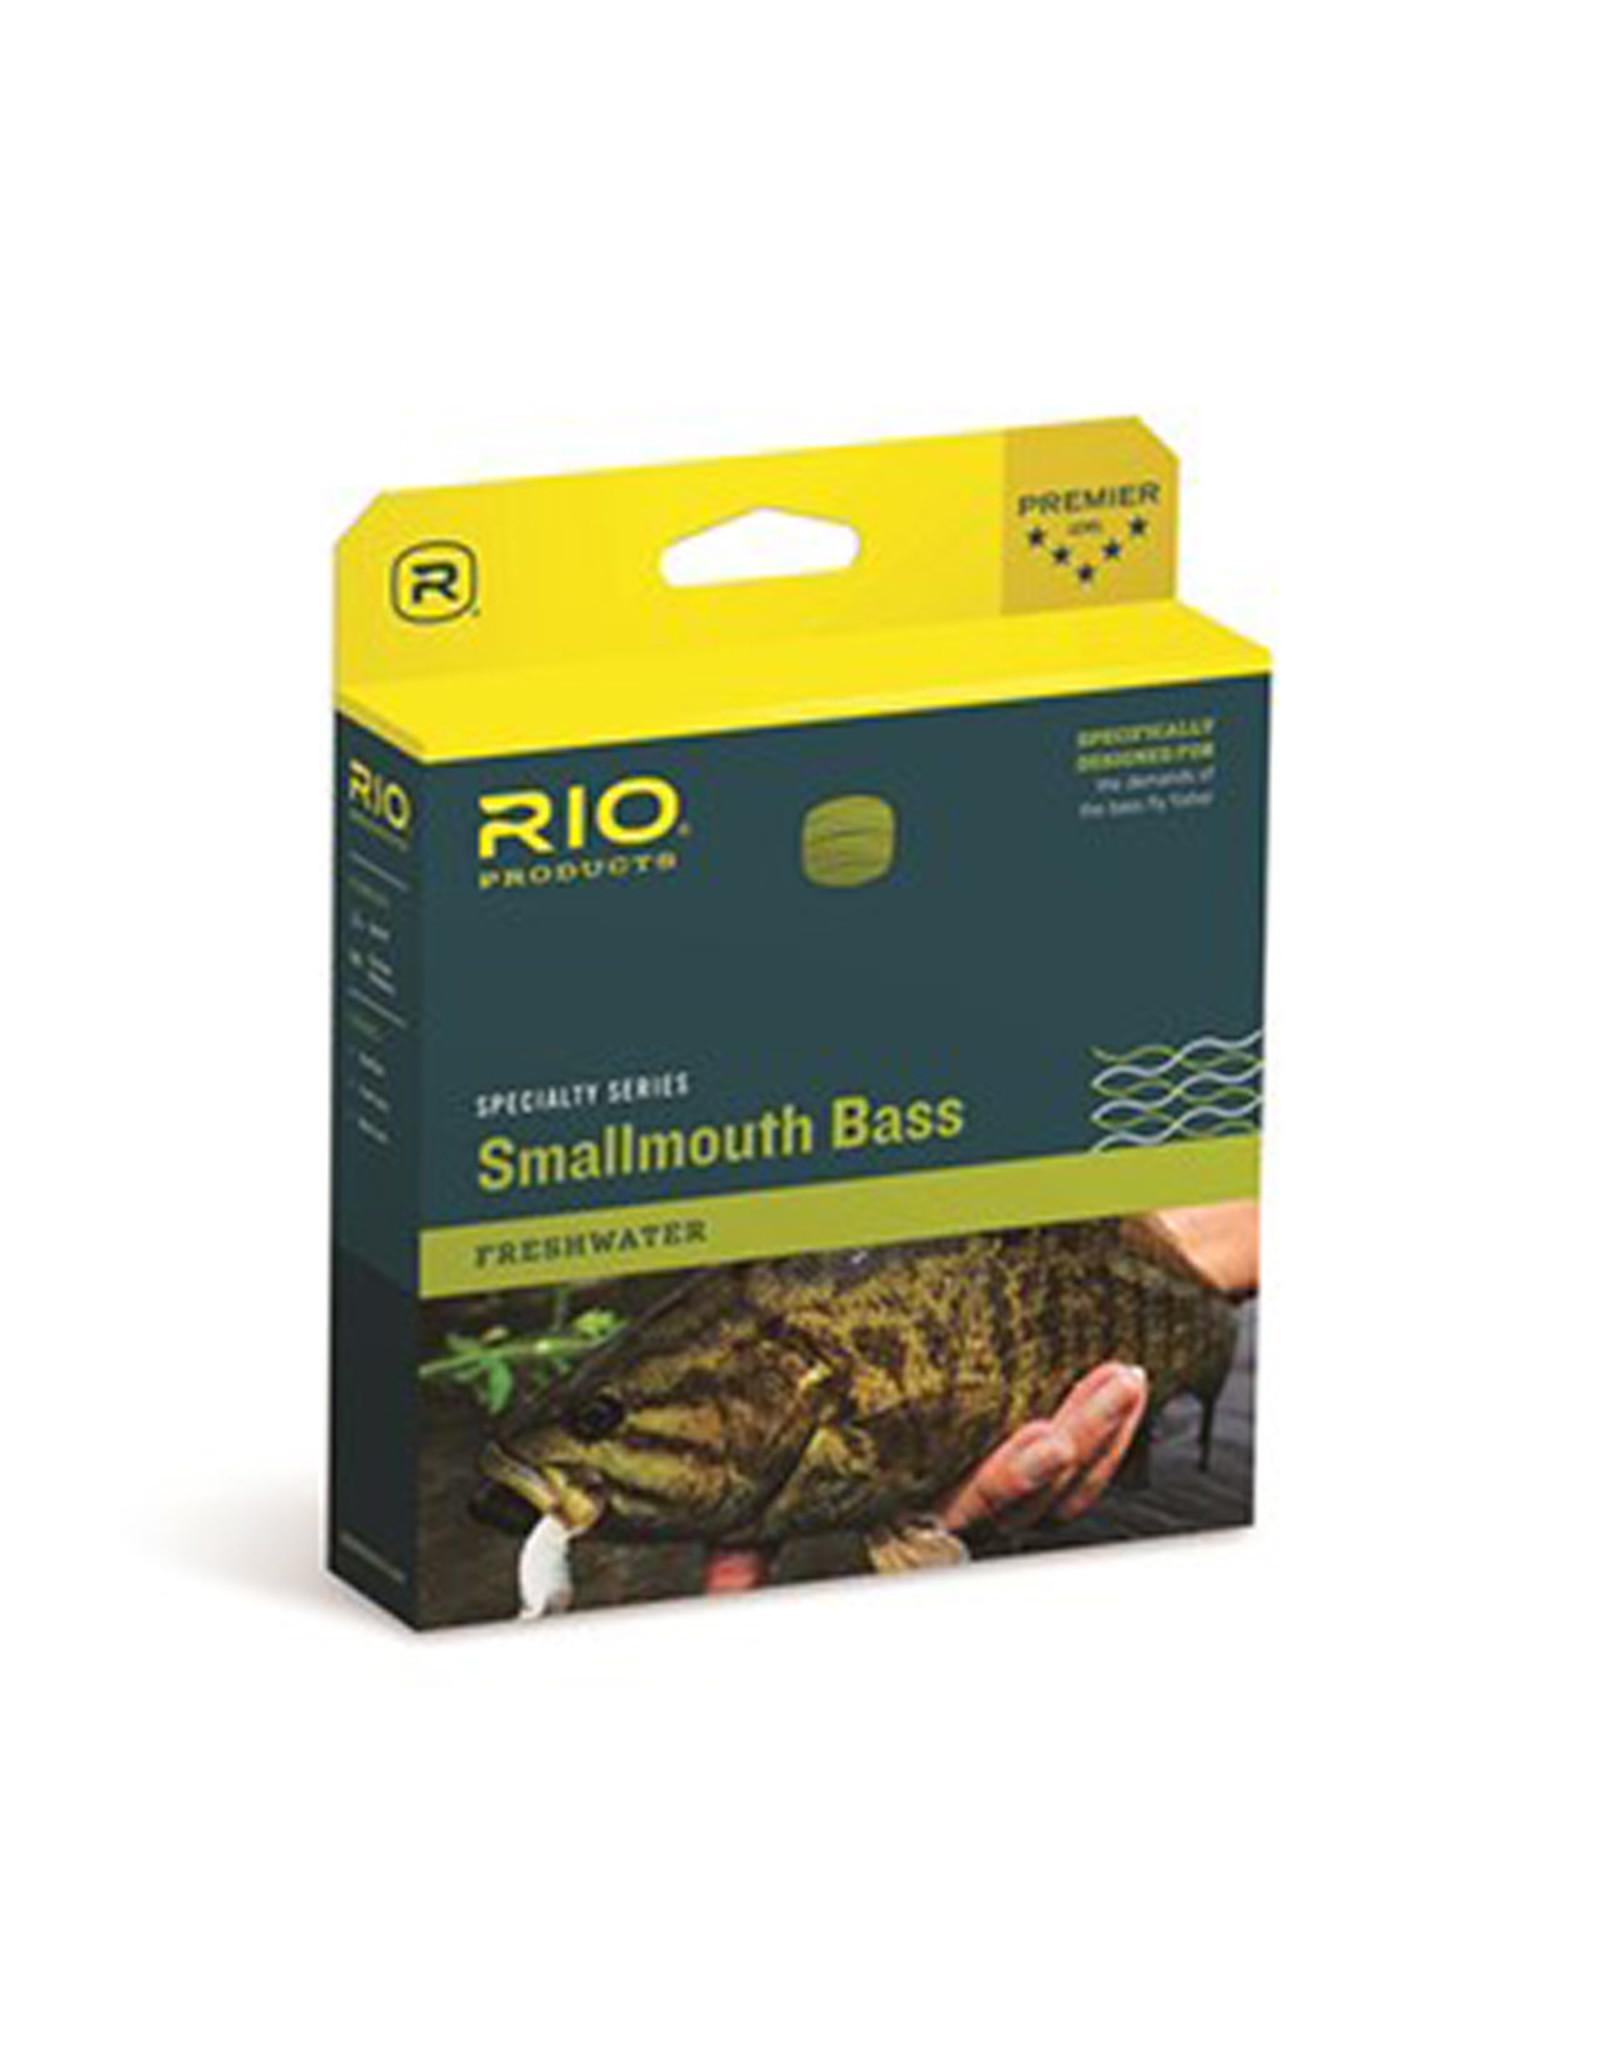 RIO Products Smallmouth Bass